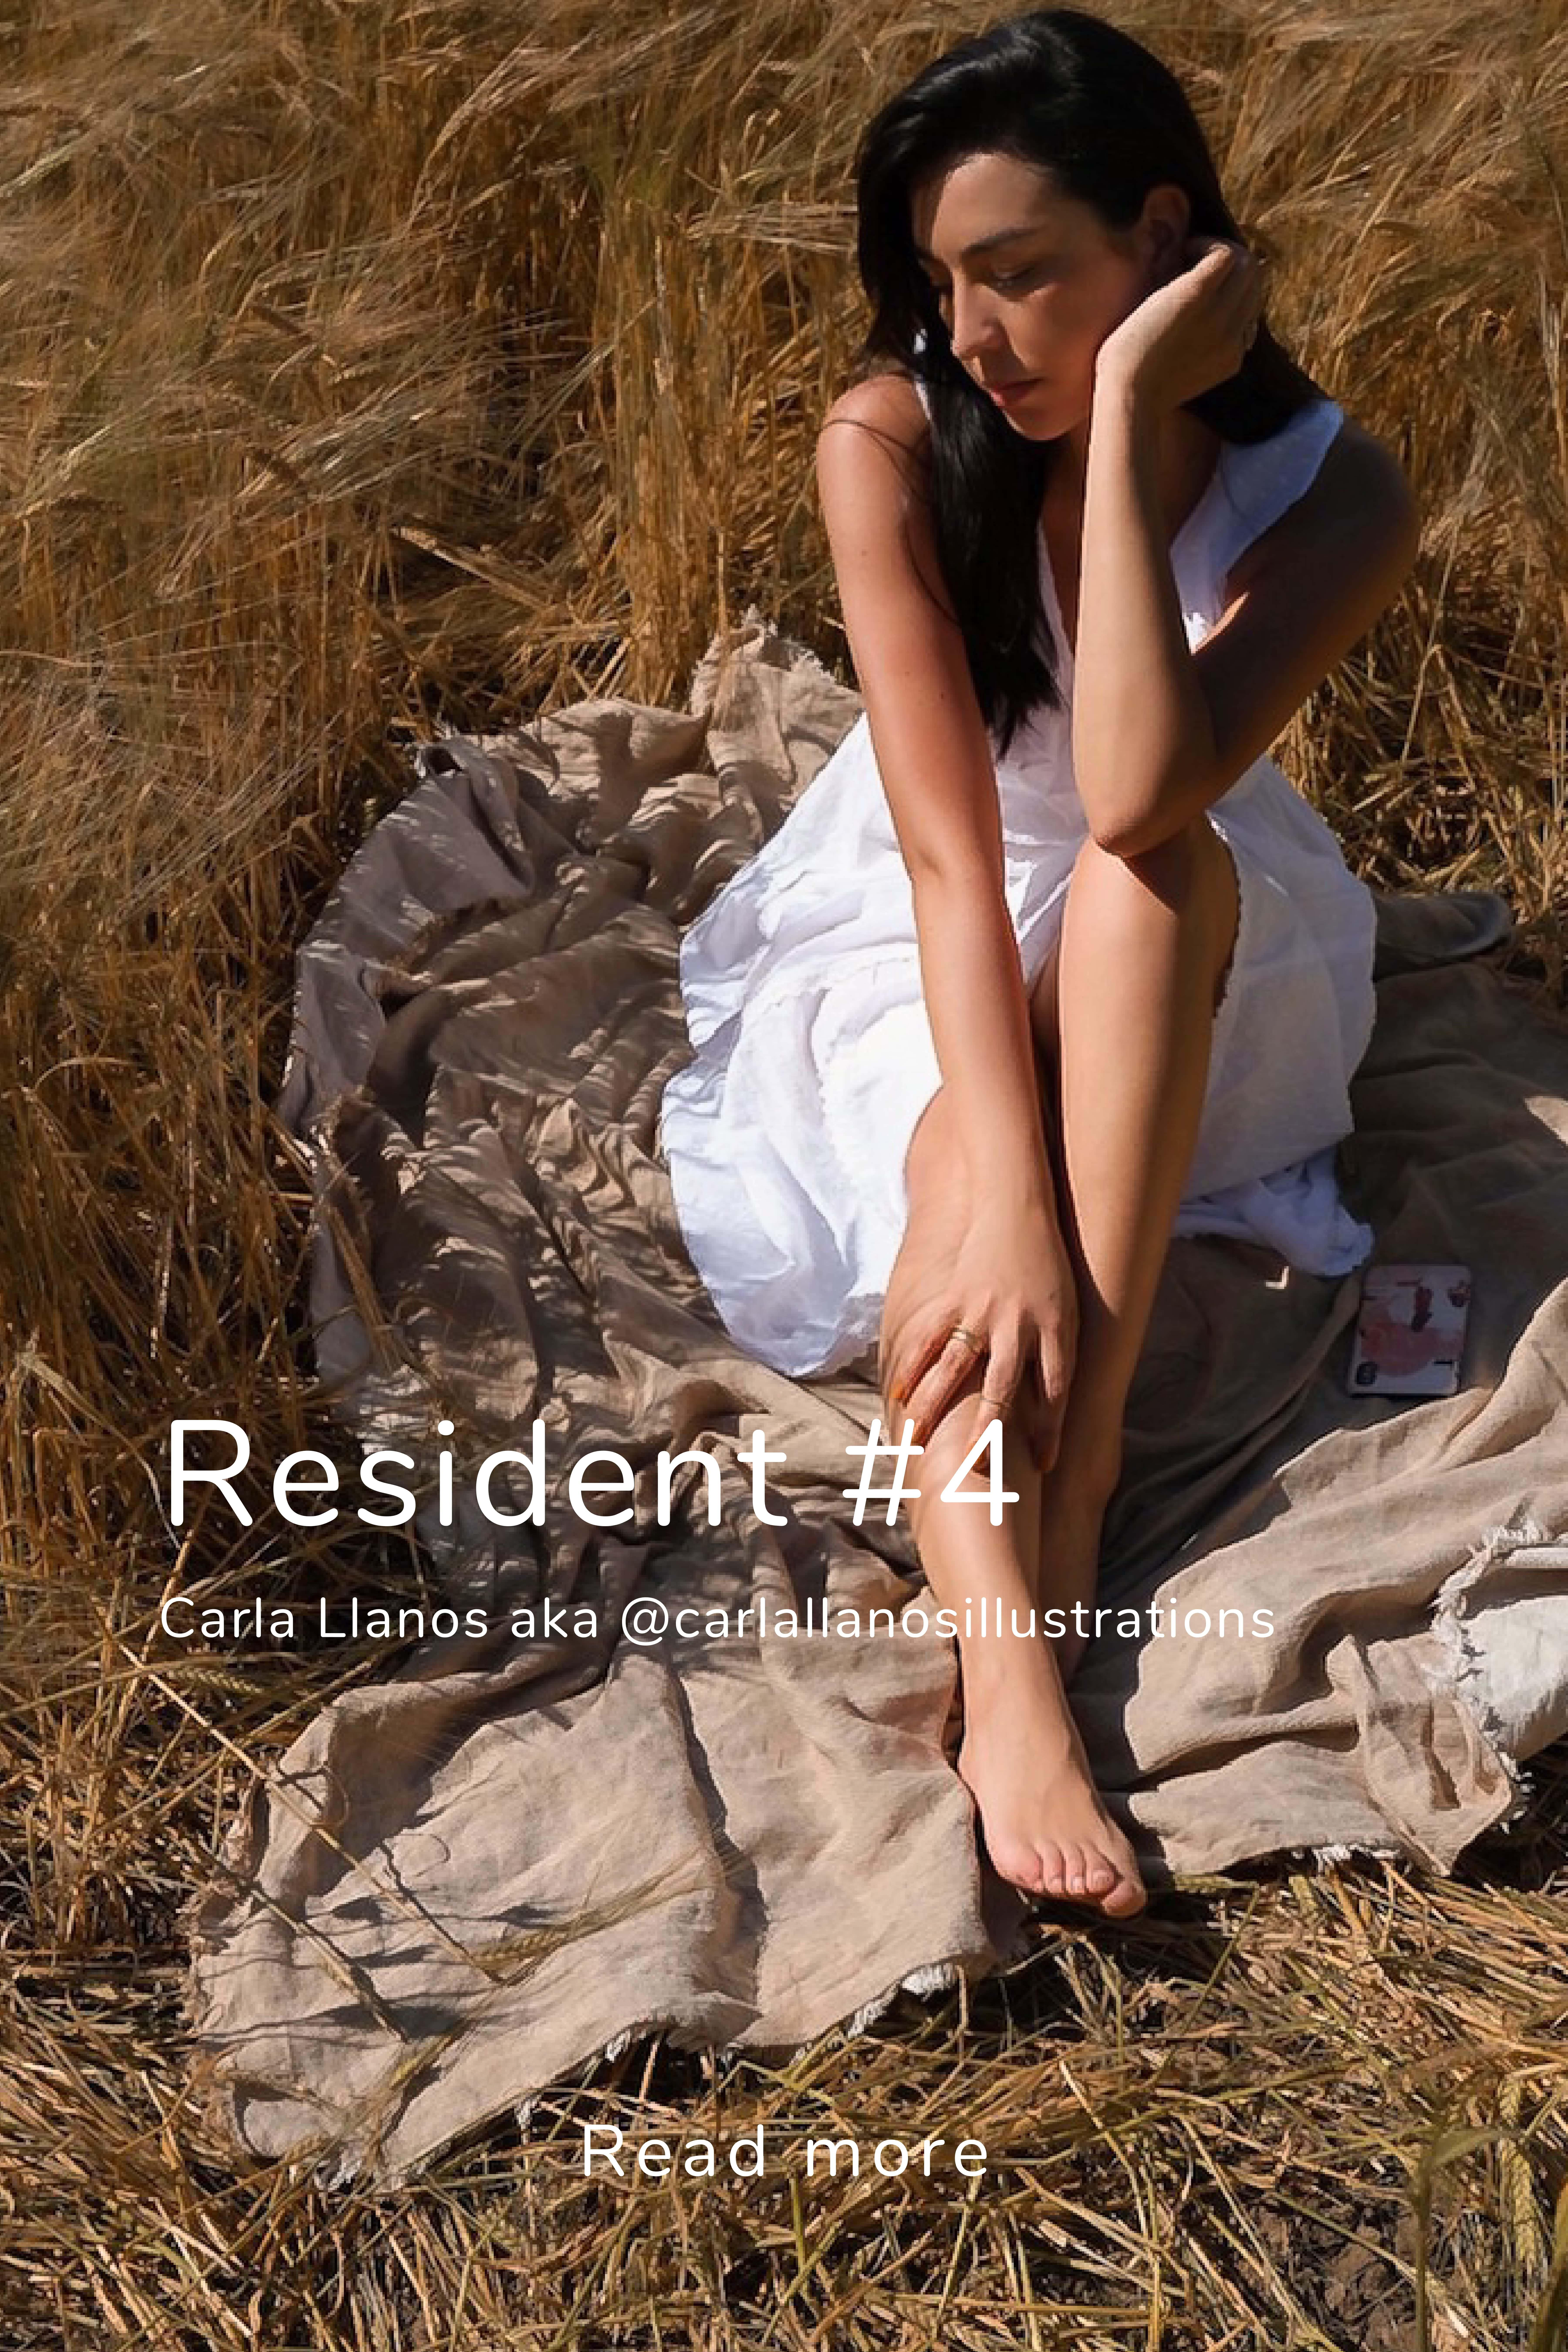 Resident #4Carla Llanos